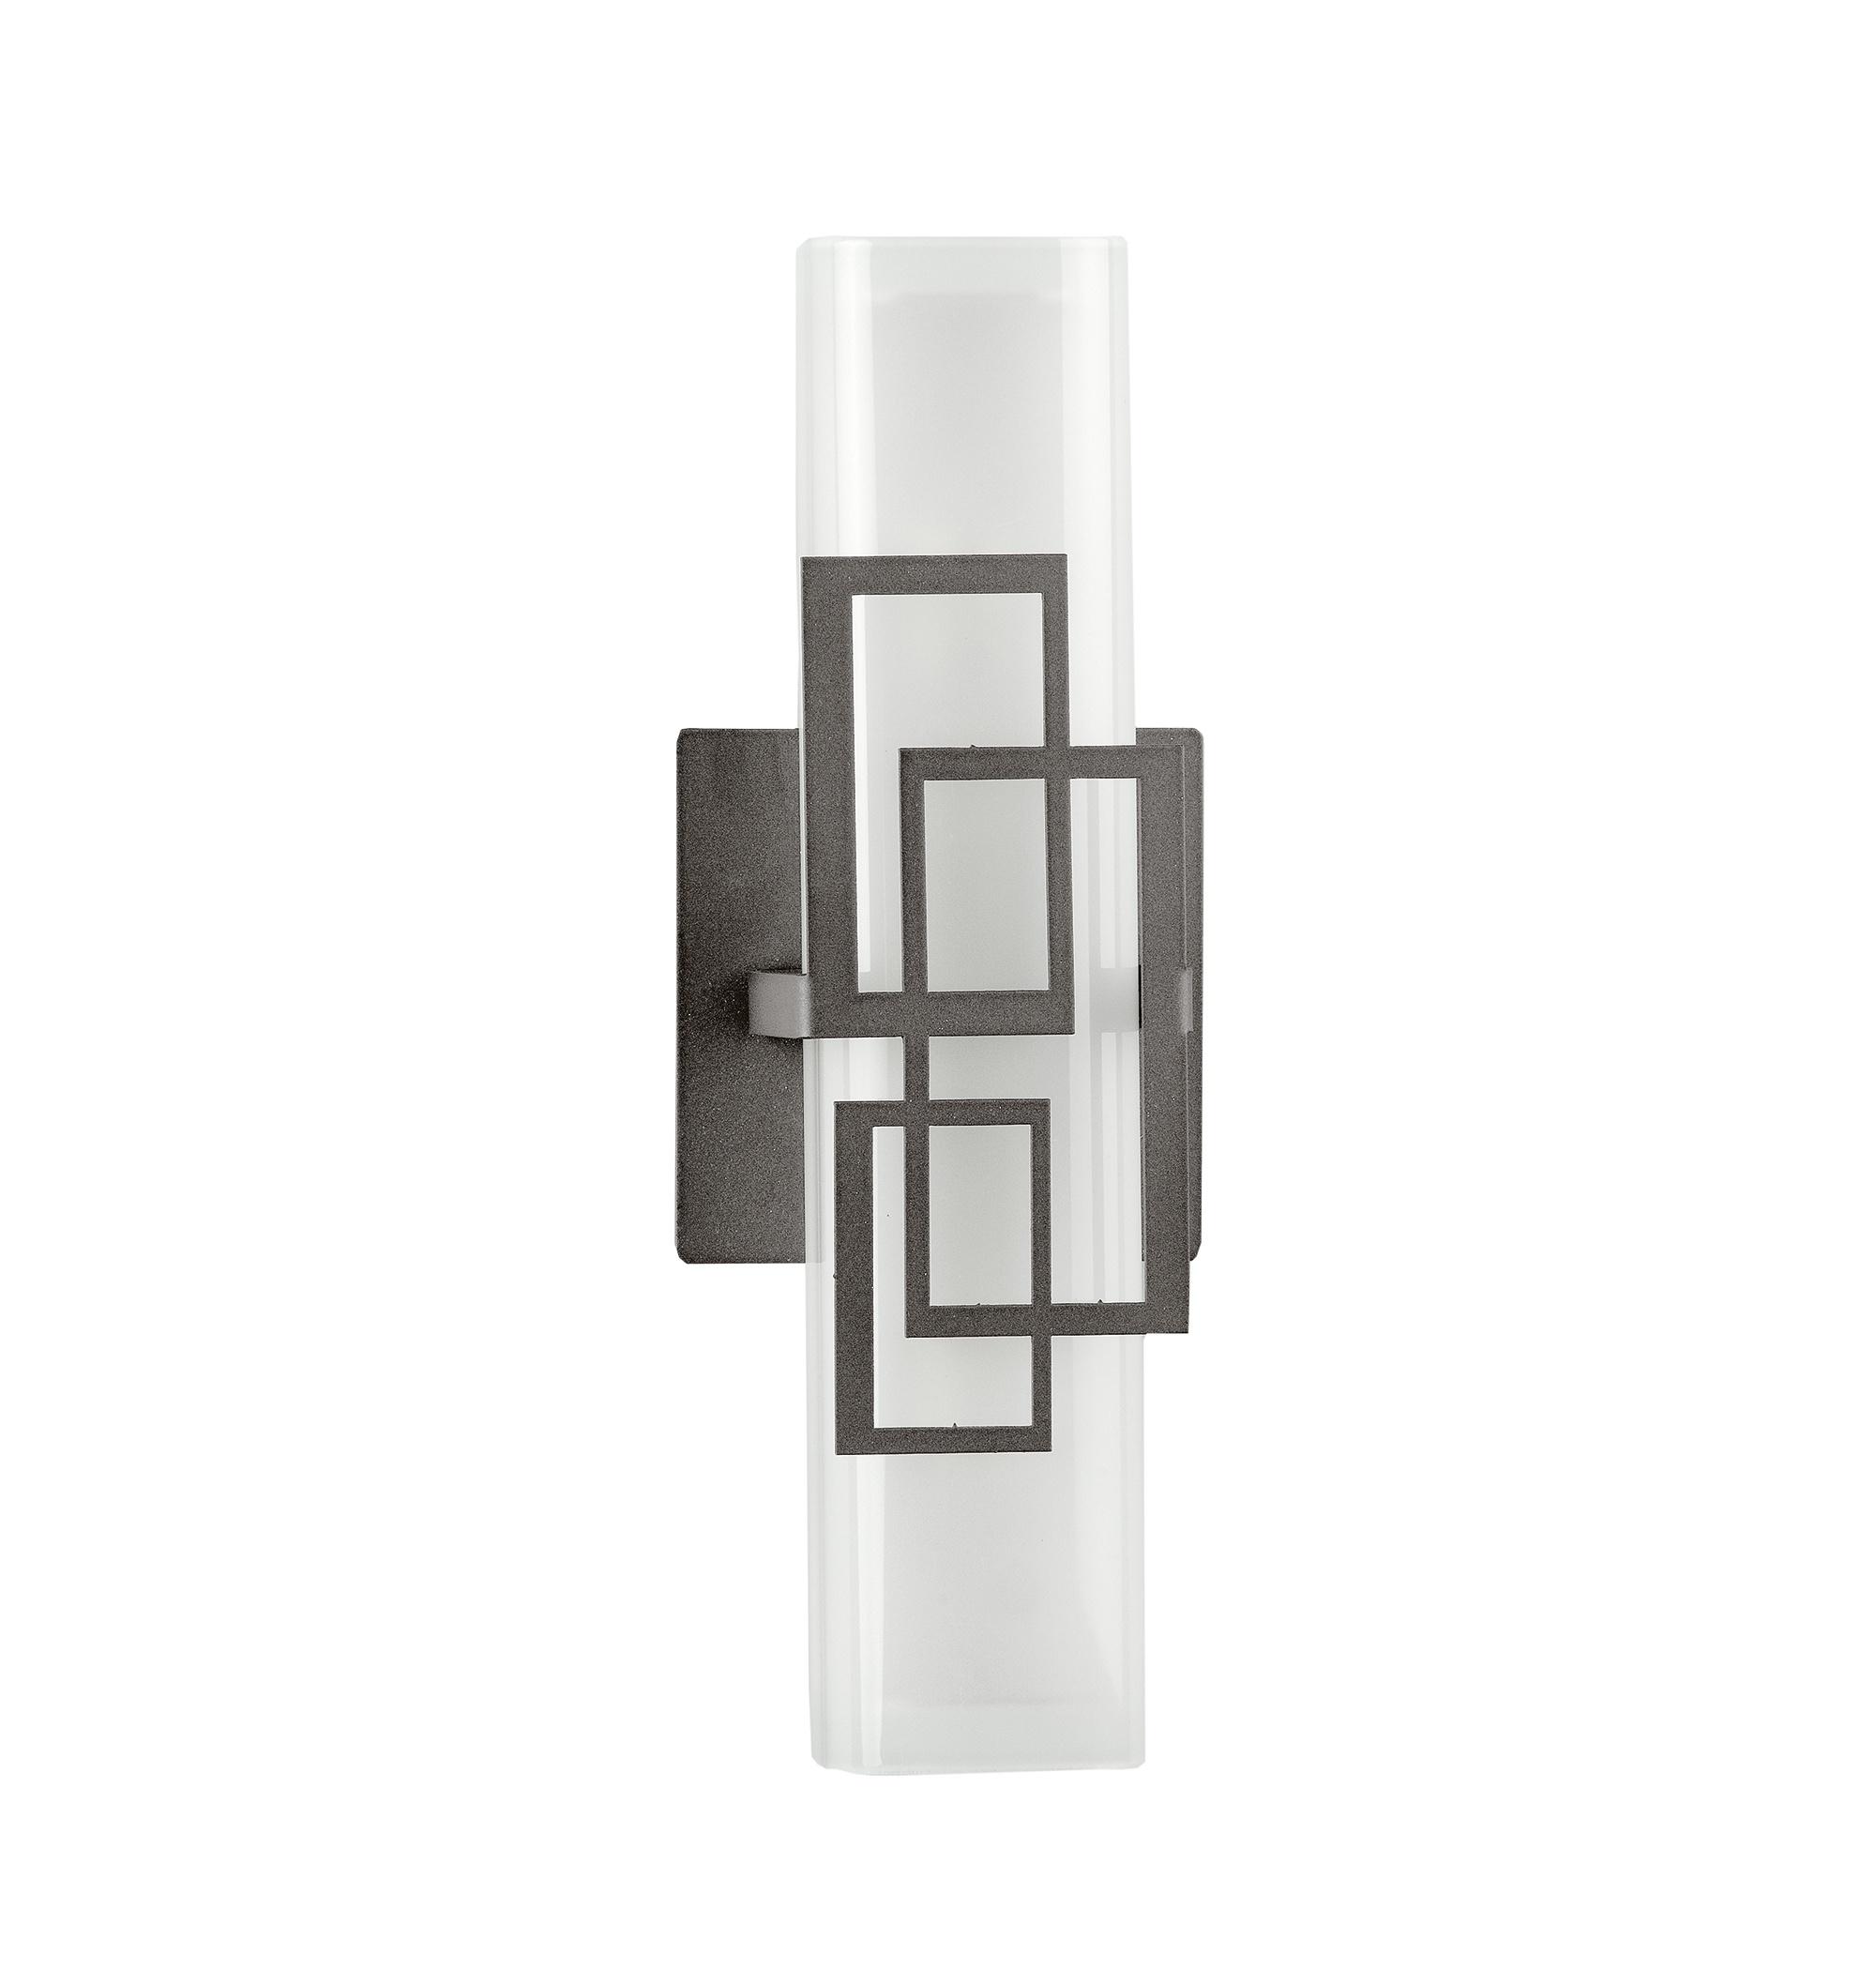 wandleuchte florenzlamp 2647 a wandleuchten innenleuchten platinlux der online shop f r. Black Bedroom Furniture Sets. Home Design Ideas